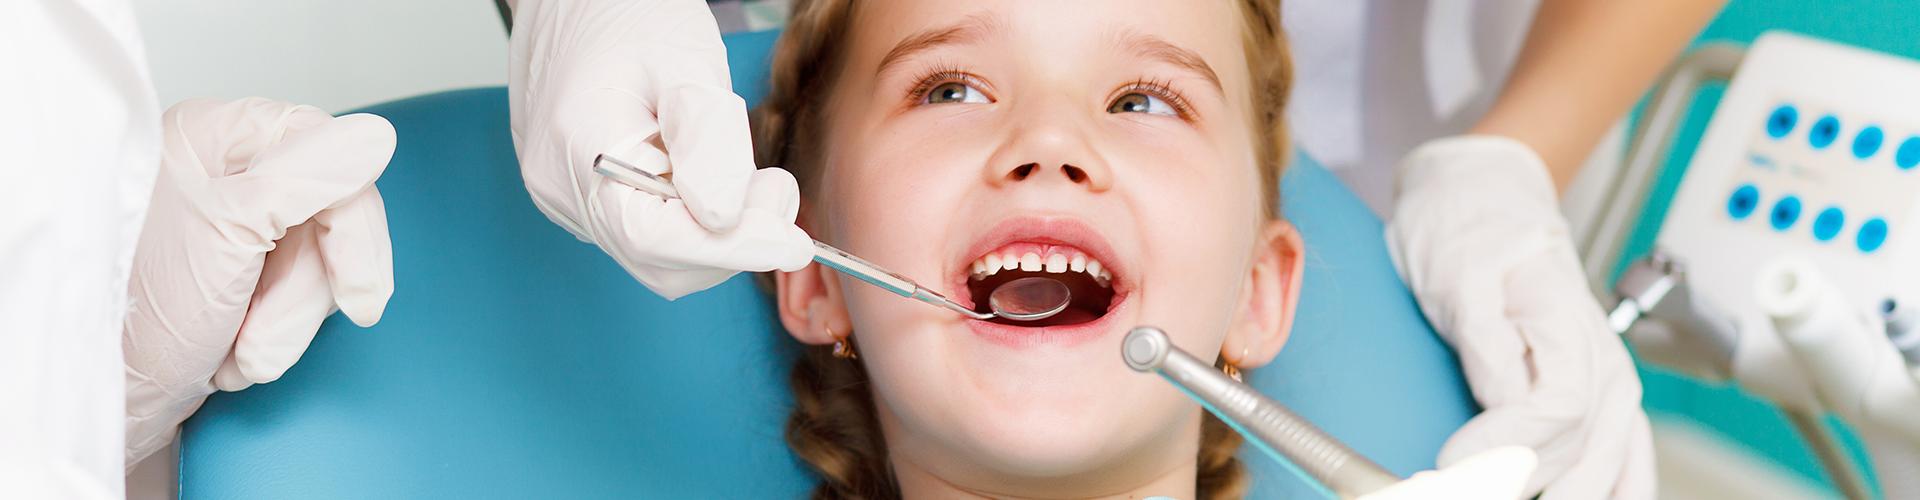 Dental Maxillofacial Surgery & Implant Unit